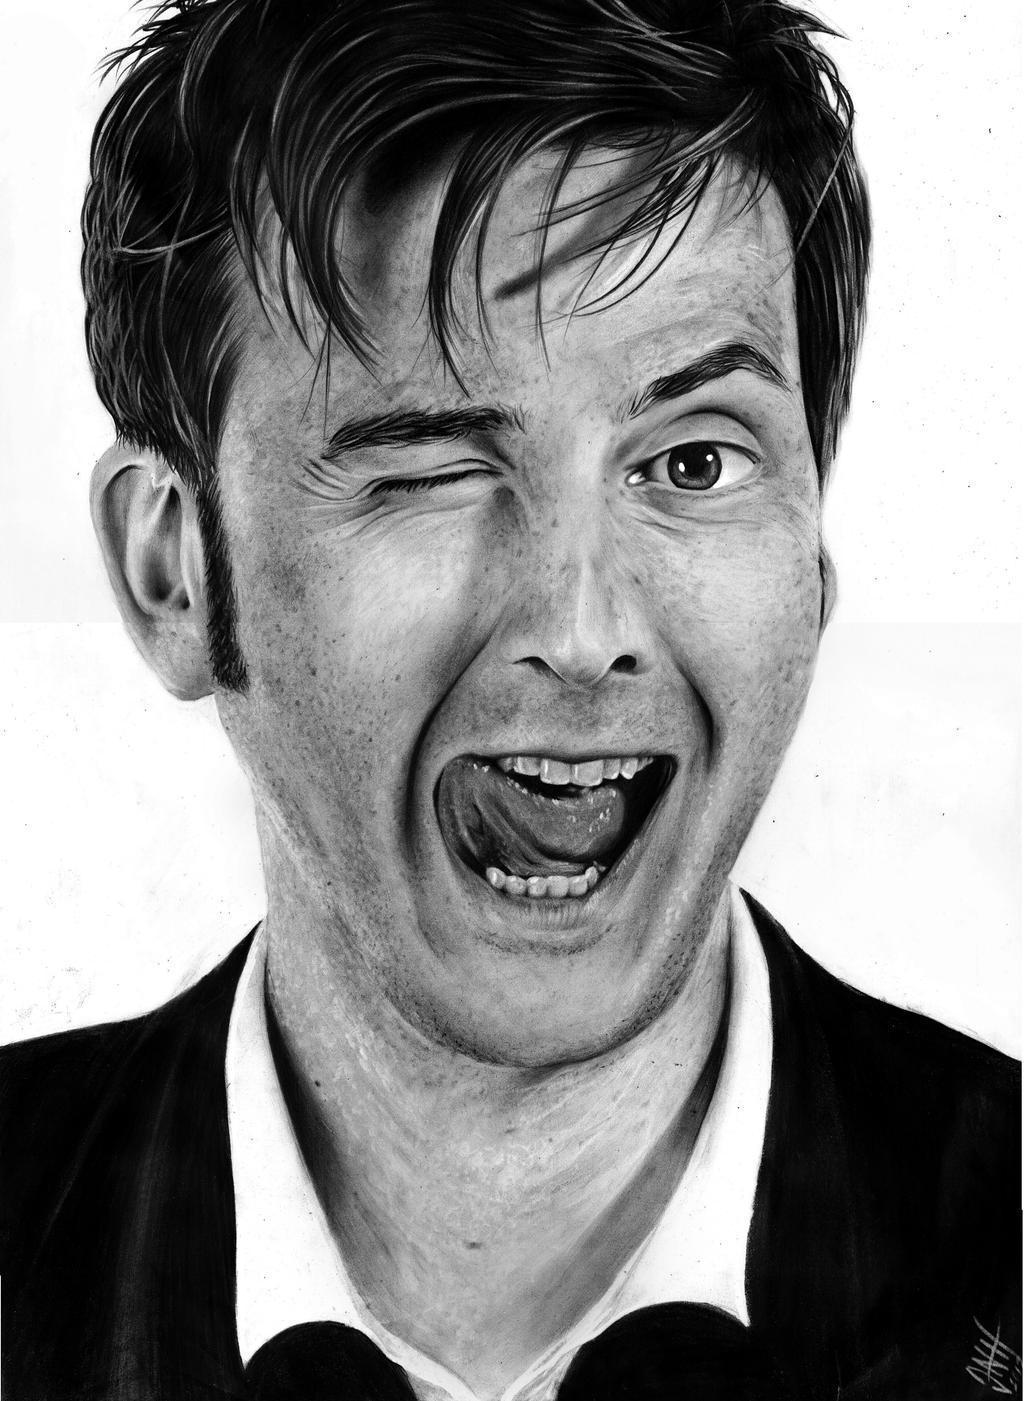 ... David Tennant Doctor Who by Mizz-Depp - david_tennant_doctor_who_by_mizz_depp-d6ppq9m